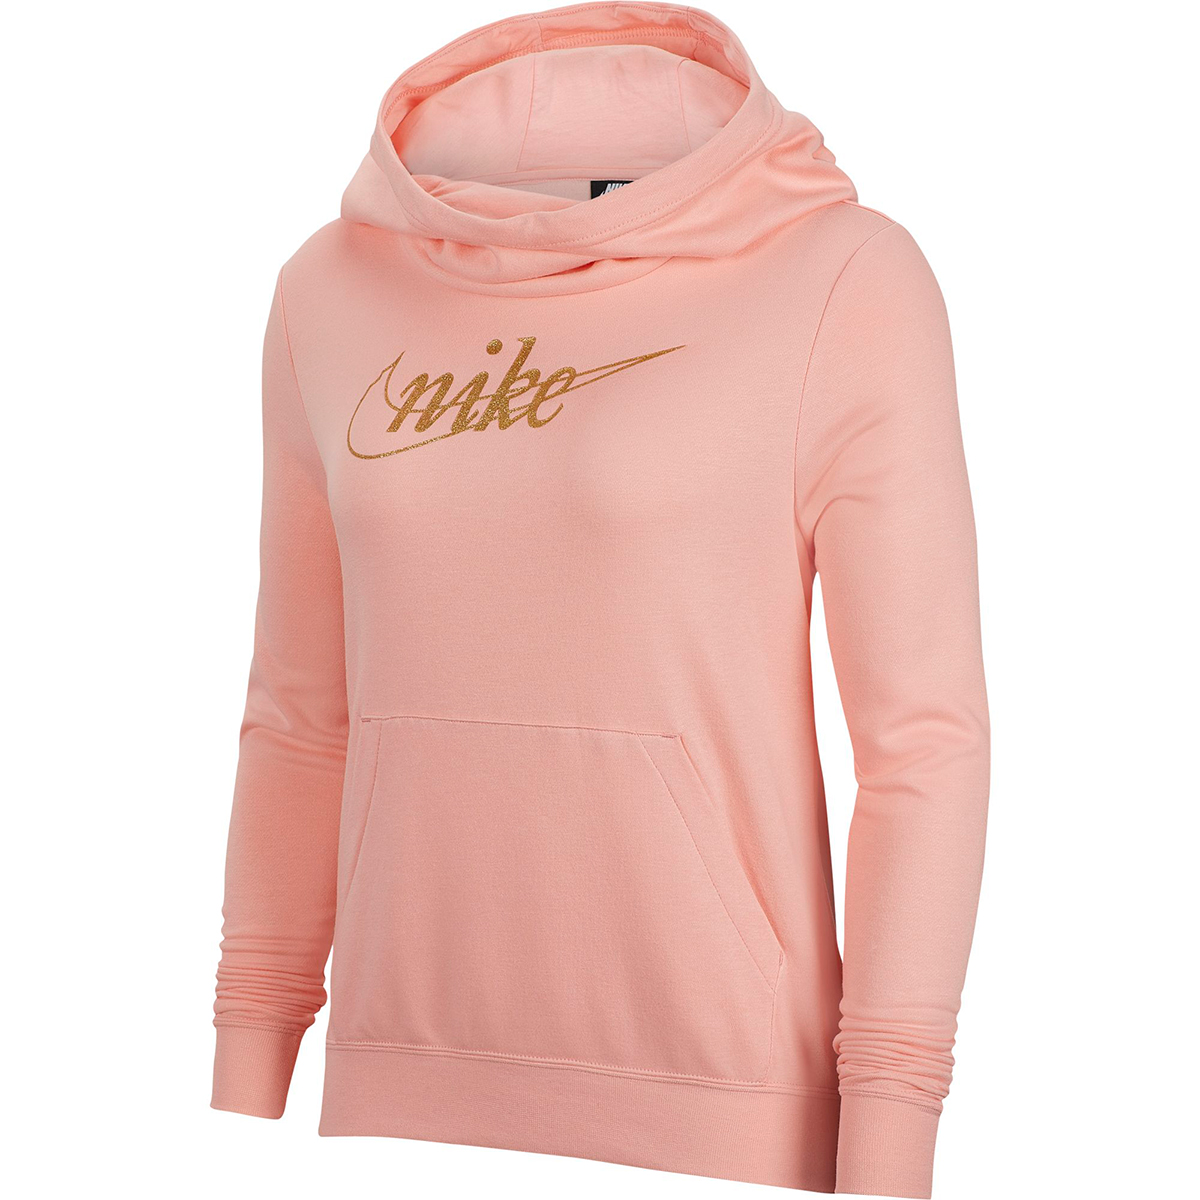 Nike Women's Glitter Logo Pullover Hoodie - Red, M